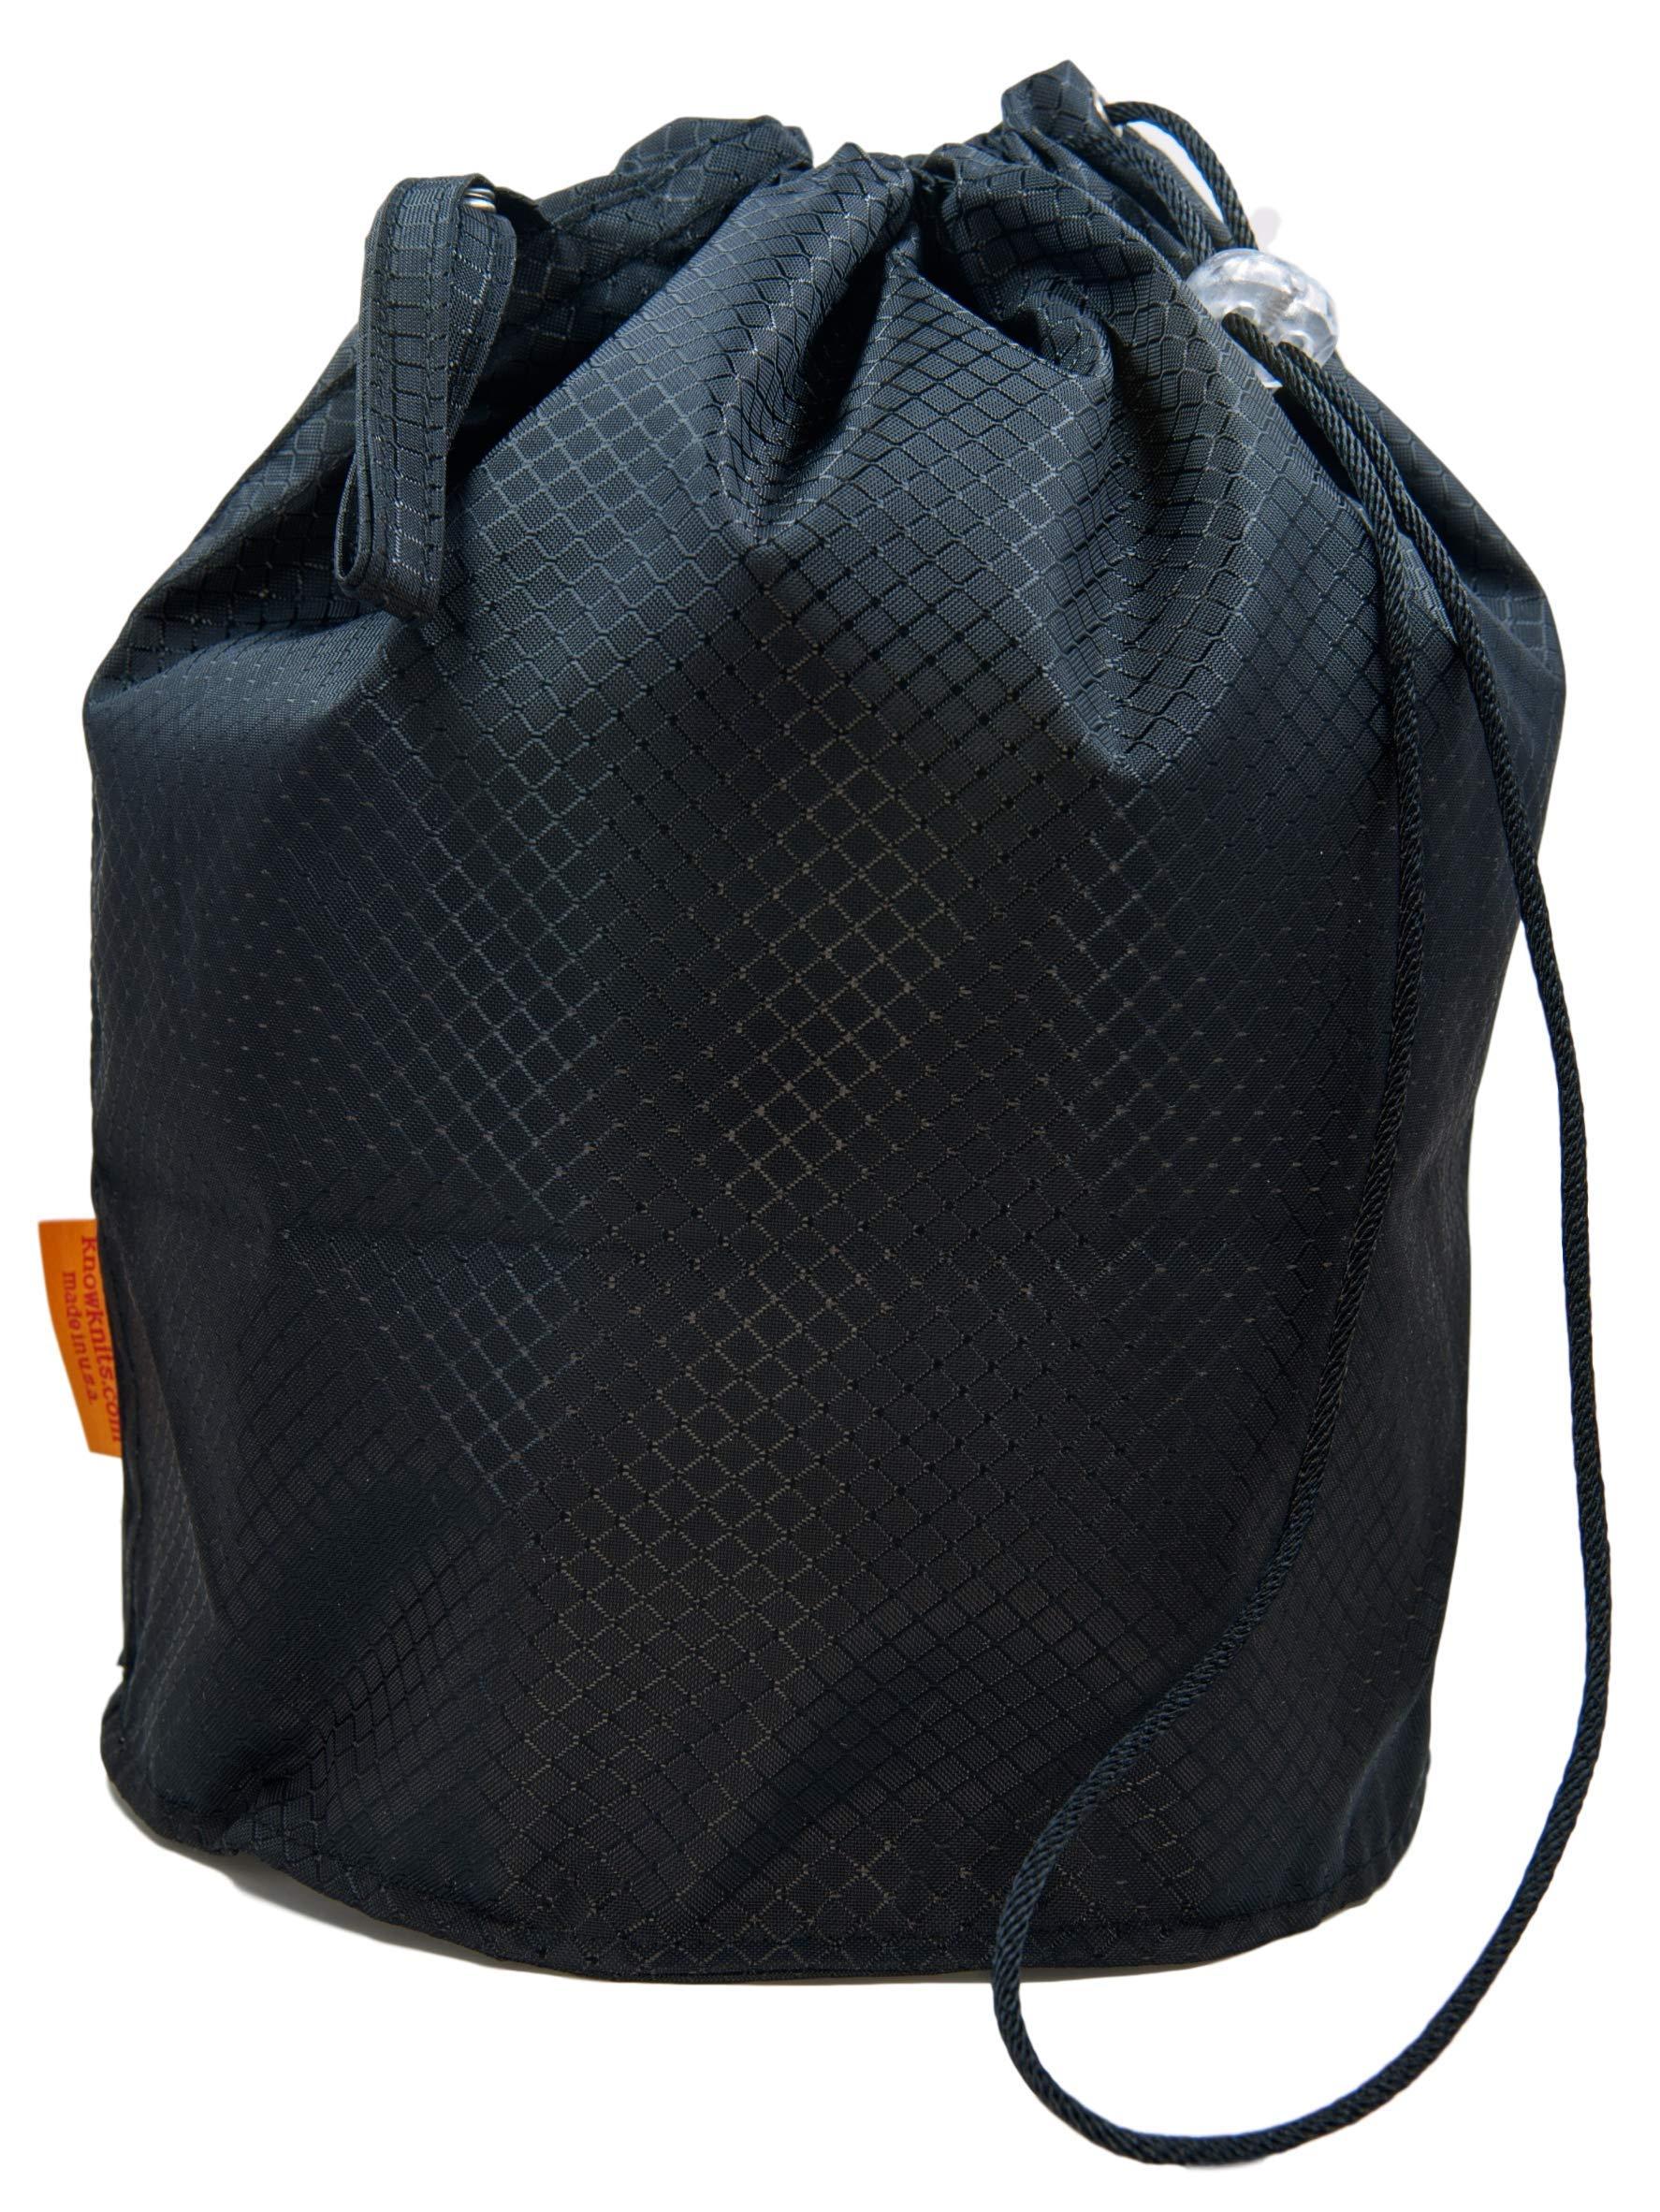 GoKnit Onyx Jewel Pouch Knitting Project Bag with Loop & Drawstring (Medium)